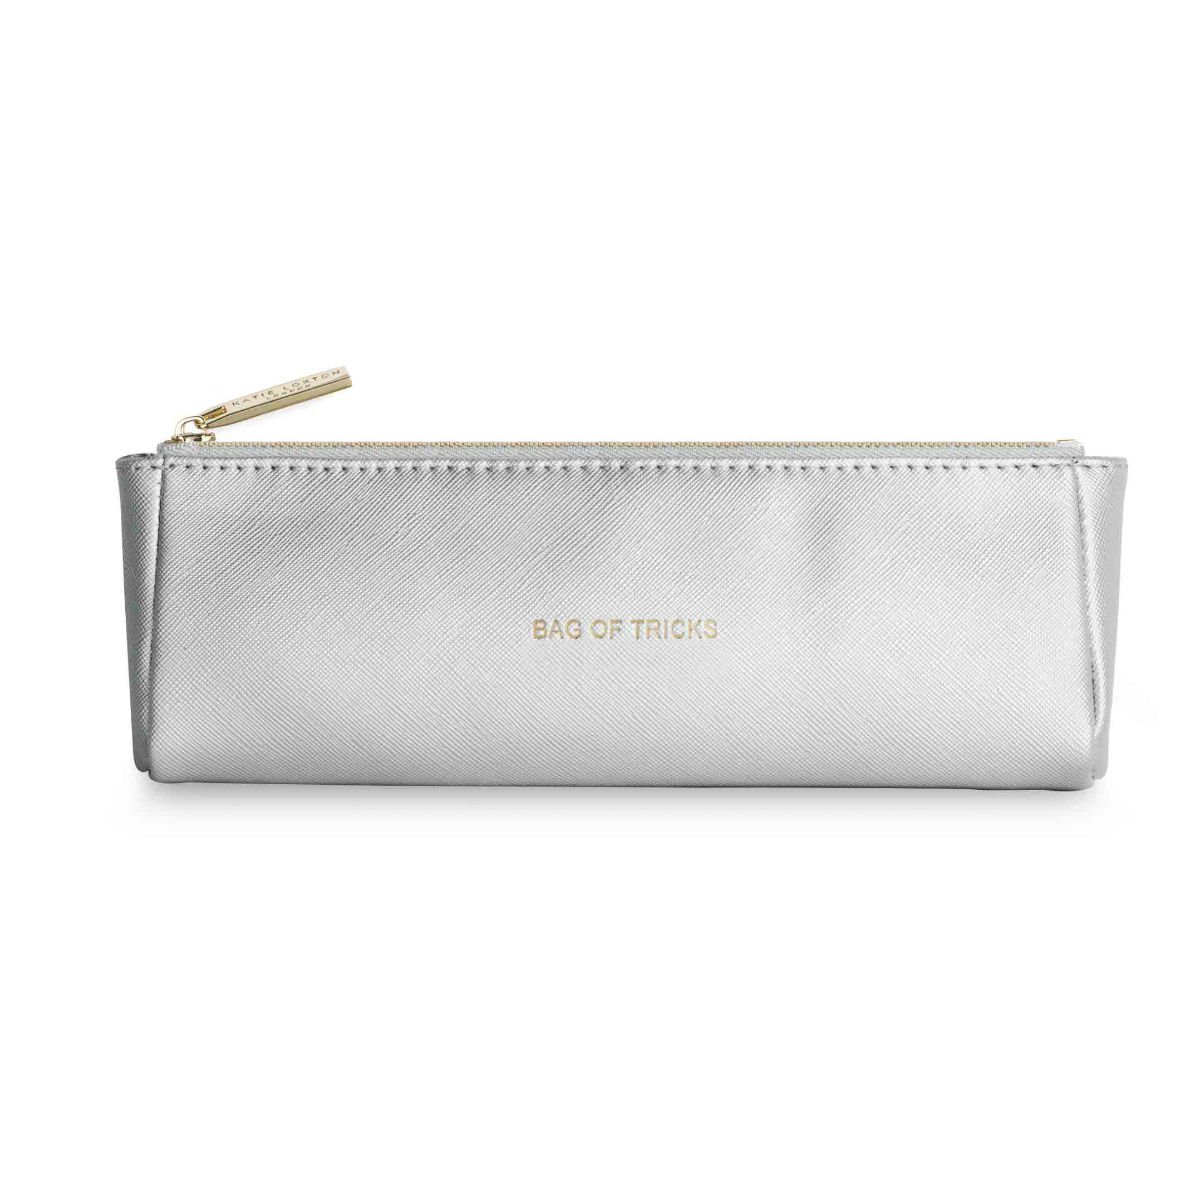 Stříbrná kosmetická taštička - Bag Of Tricks